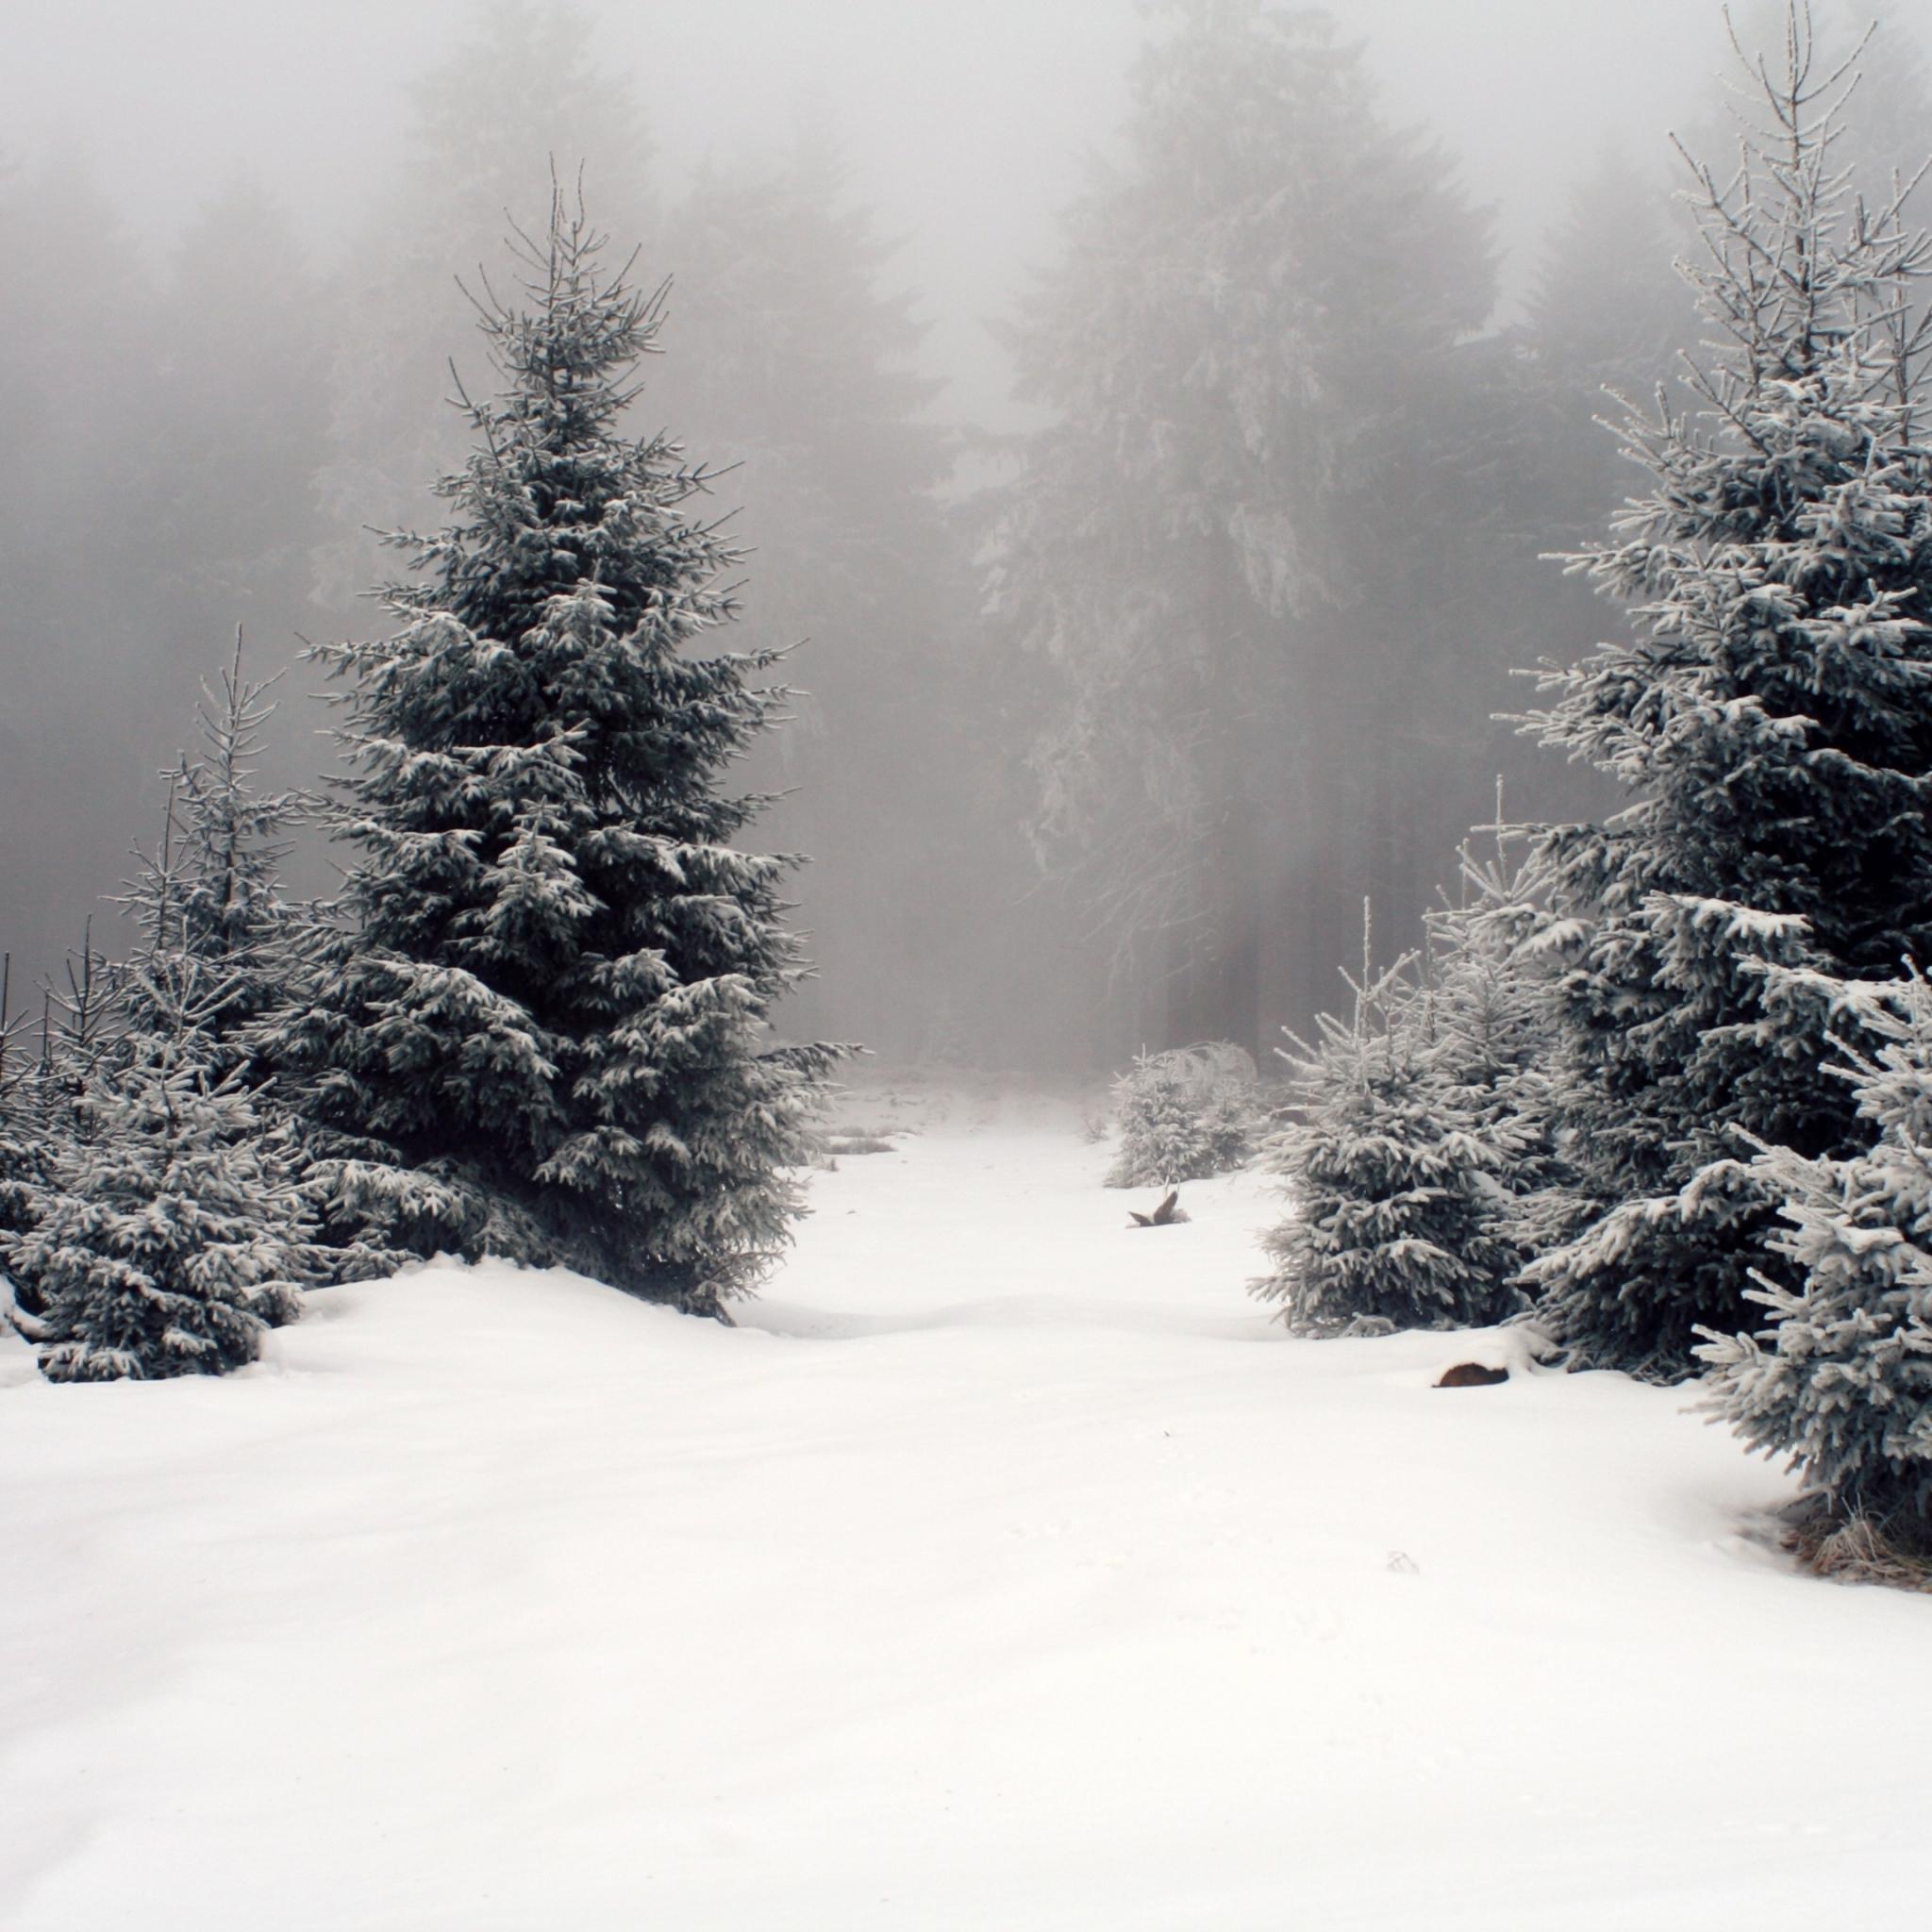 Winter Wallpaper: Free Winter IPad Wallpapers